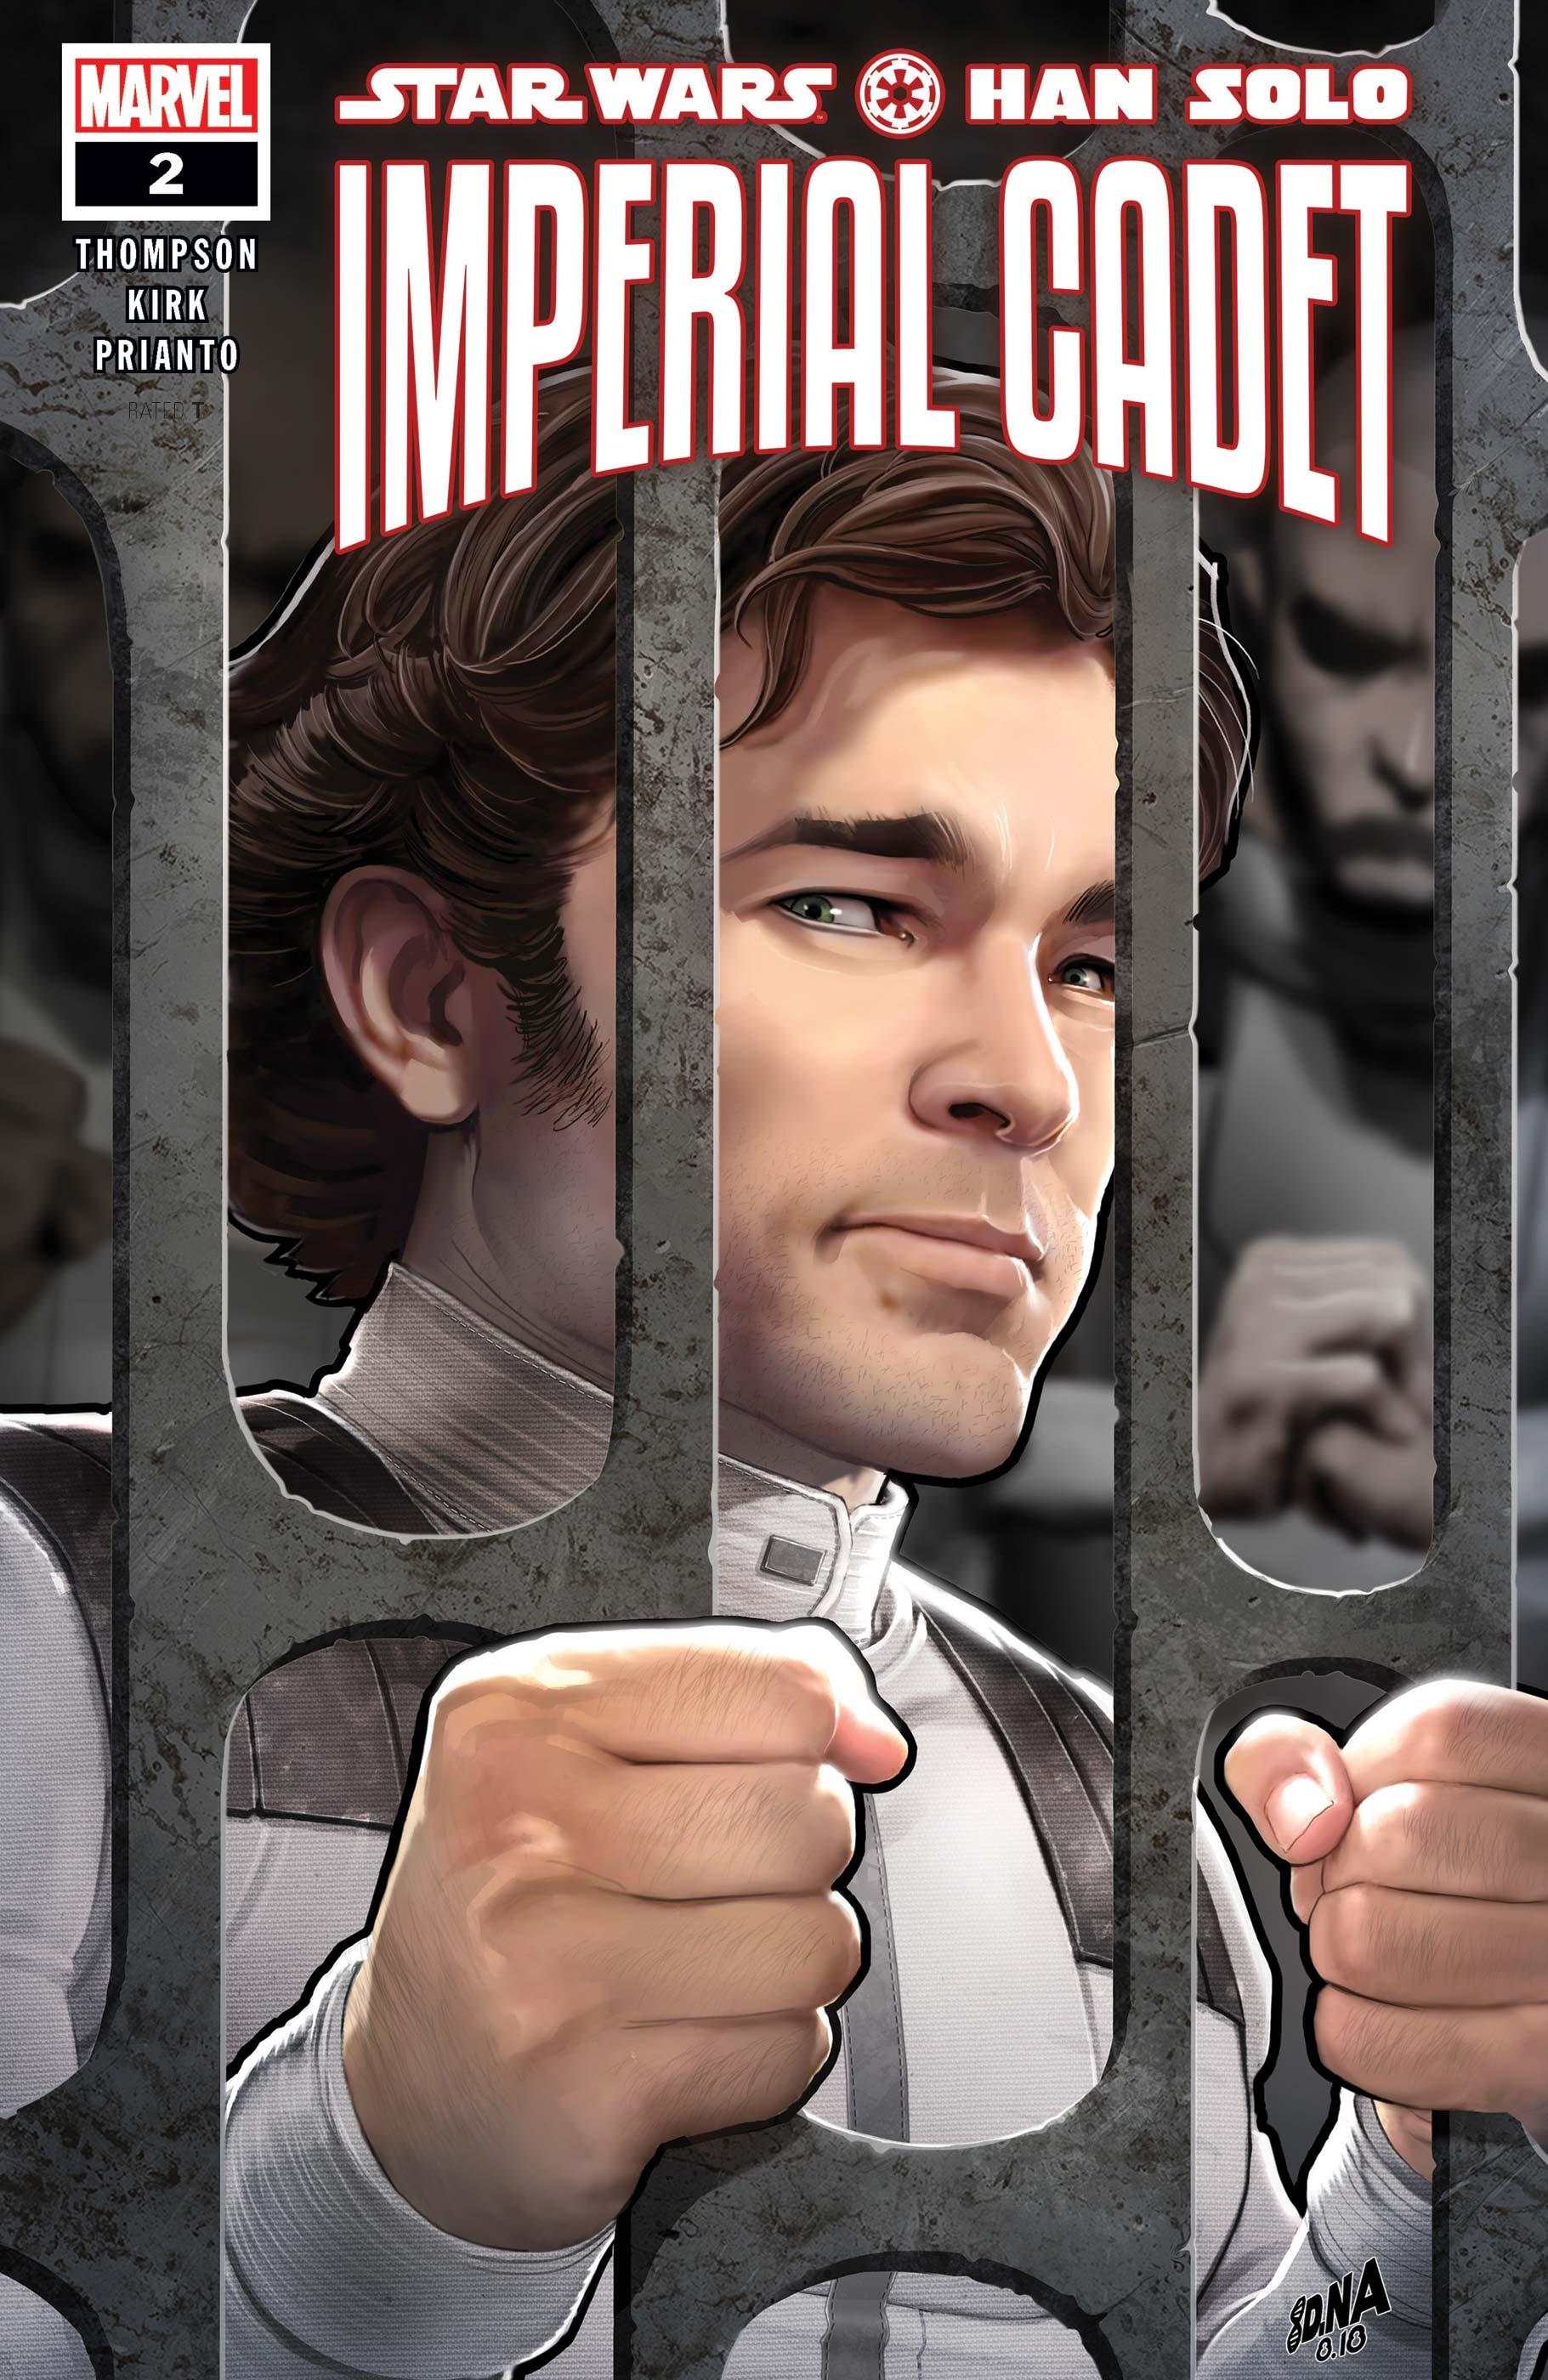 Star Wars: Han Solo - Imperial Cadet (2018) #2